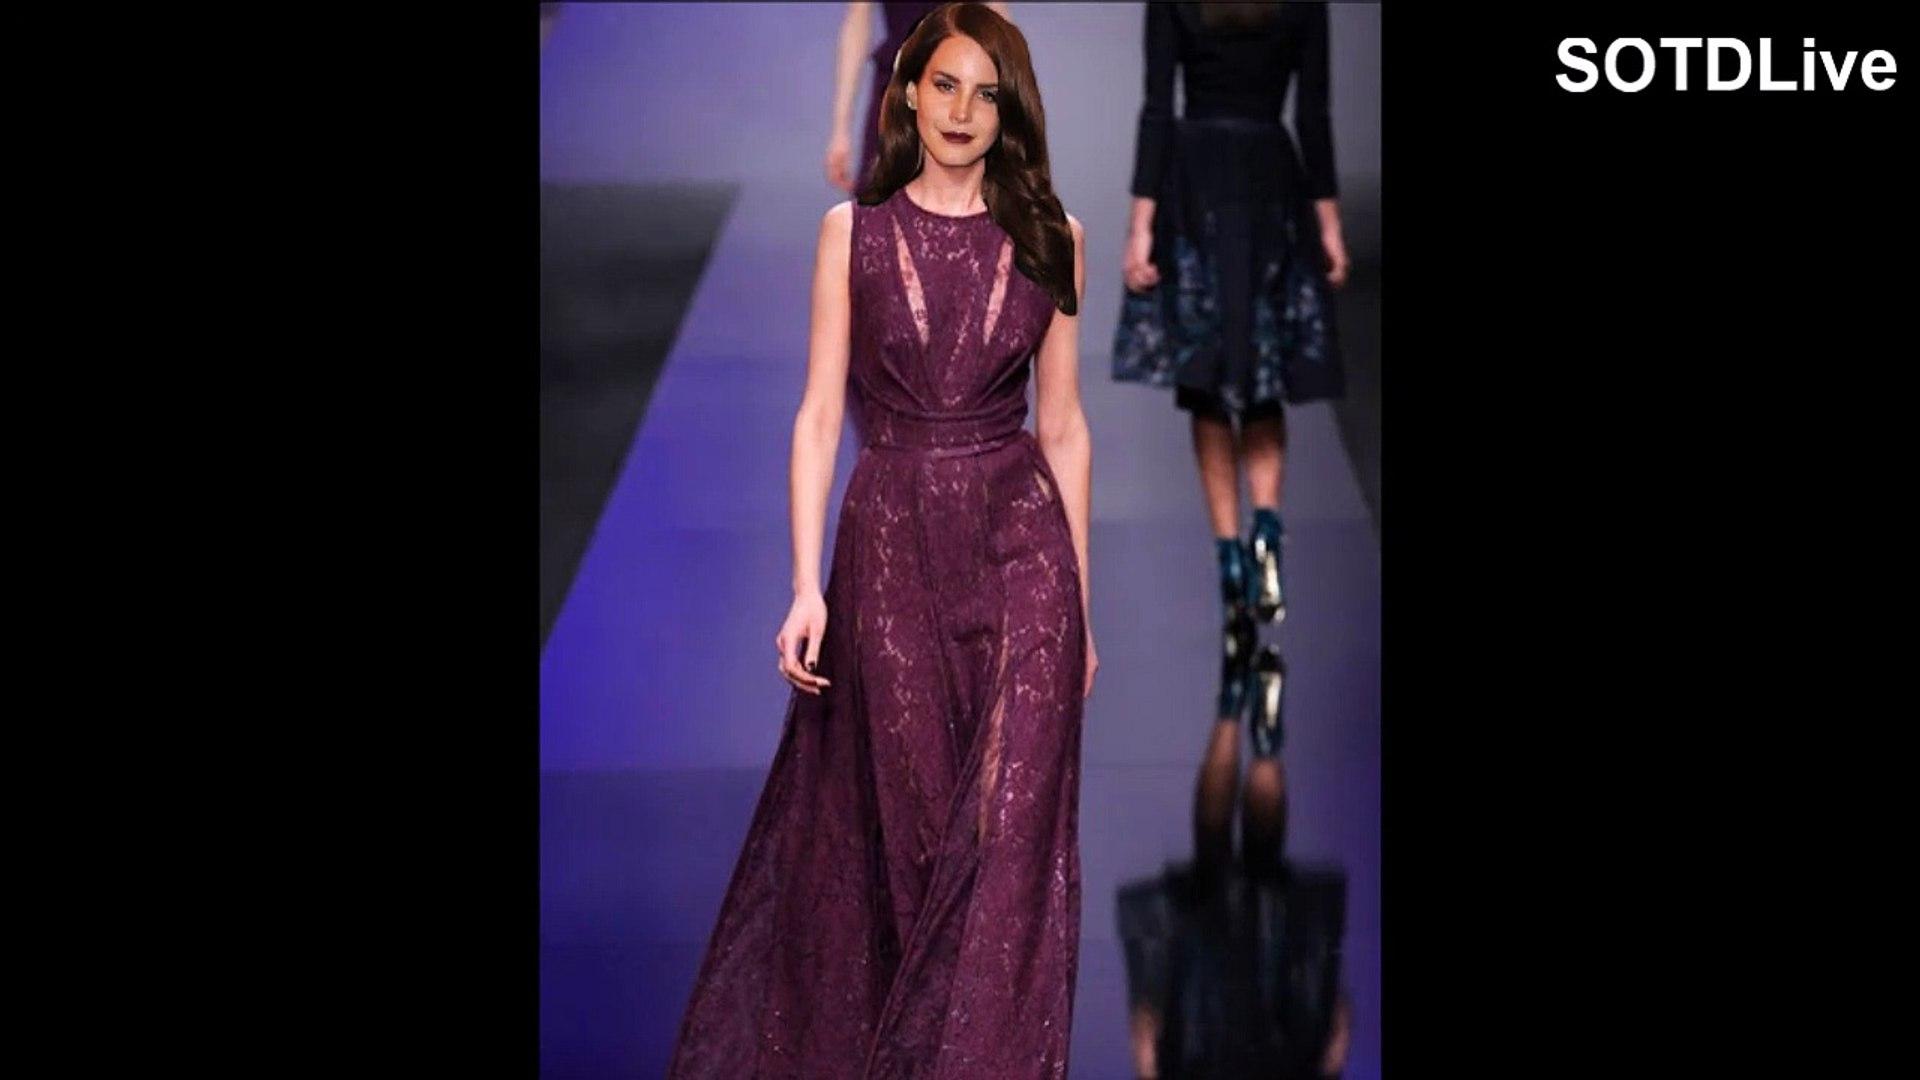 LANA DEL REY looks RAVISHING in PURPLE DRESS | SOTDLive | Episode 8